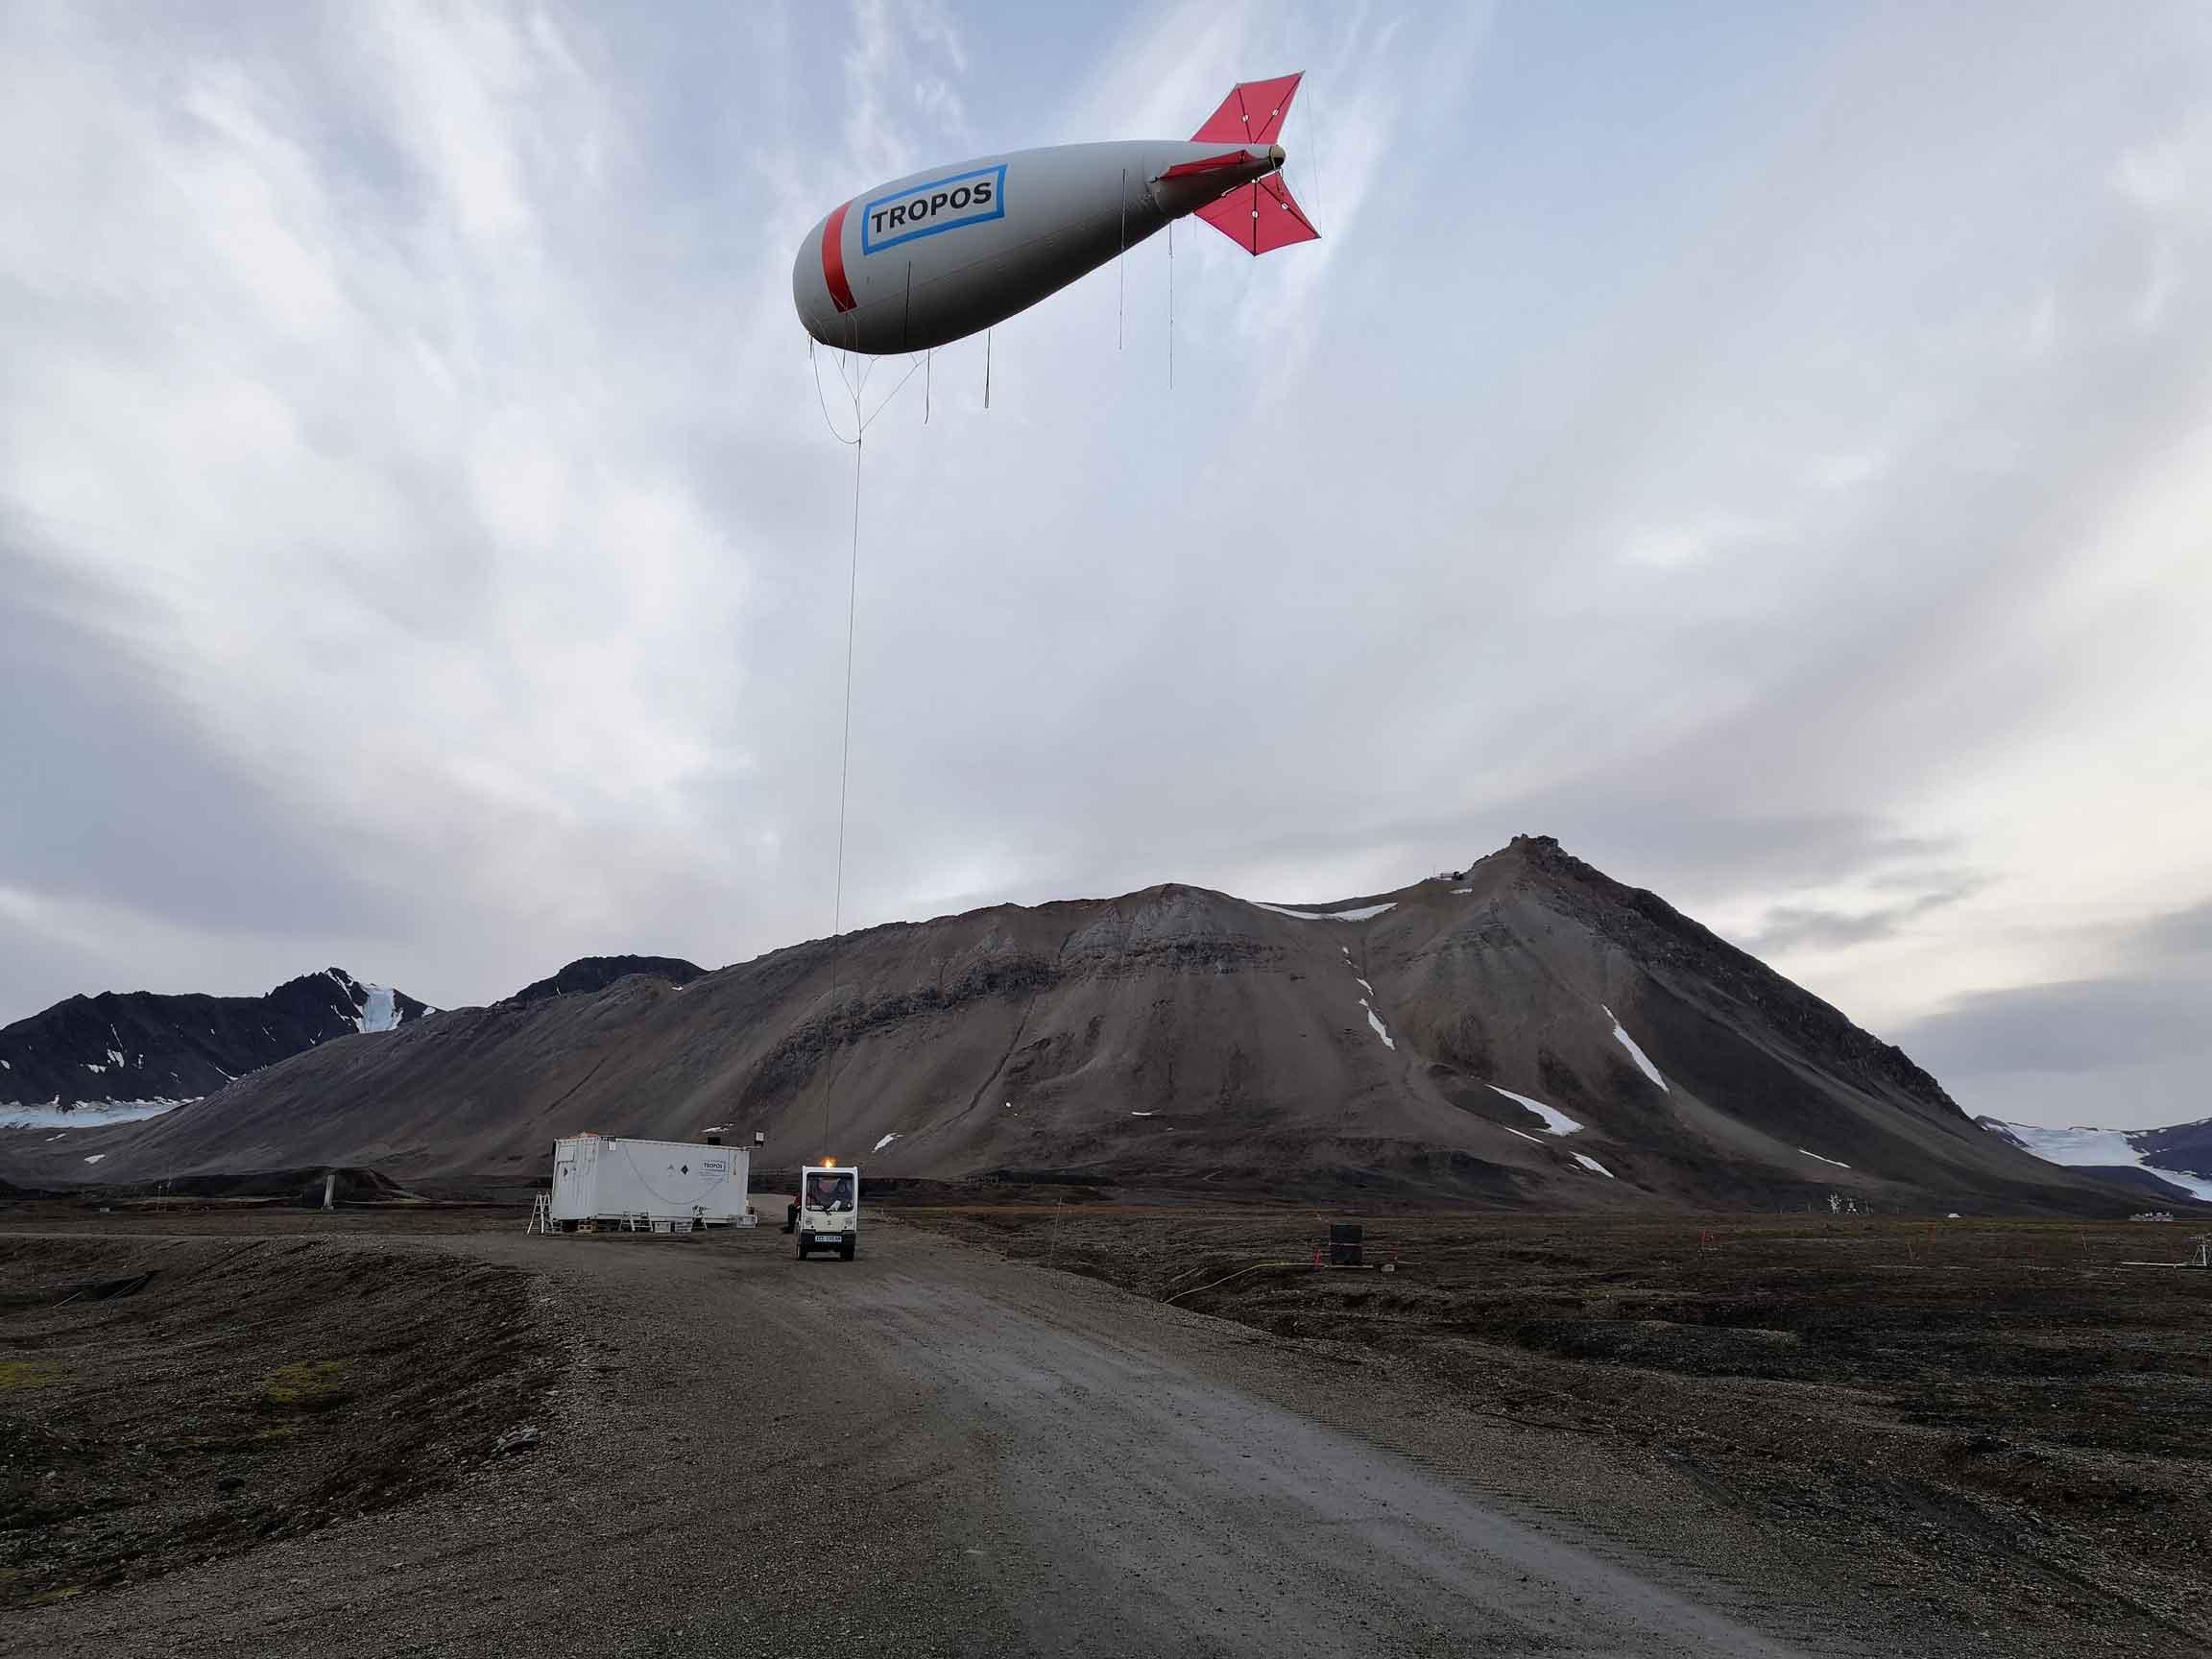 Balloon is prepared for the first measurement flight (Photo: Michael Lonardi, Uni Leipzig)